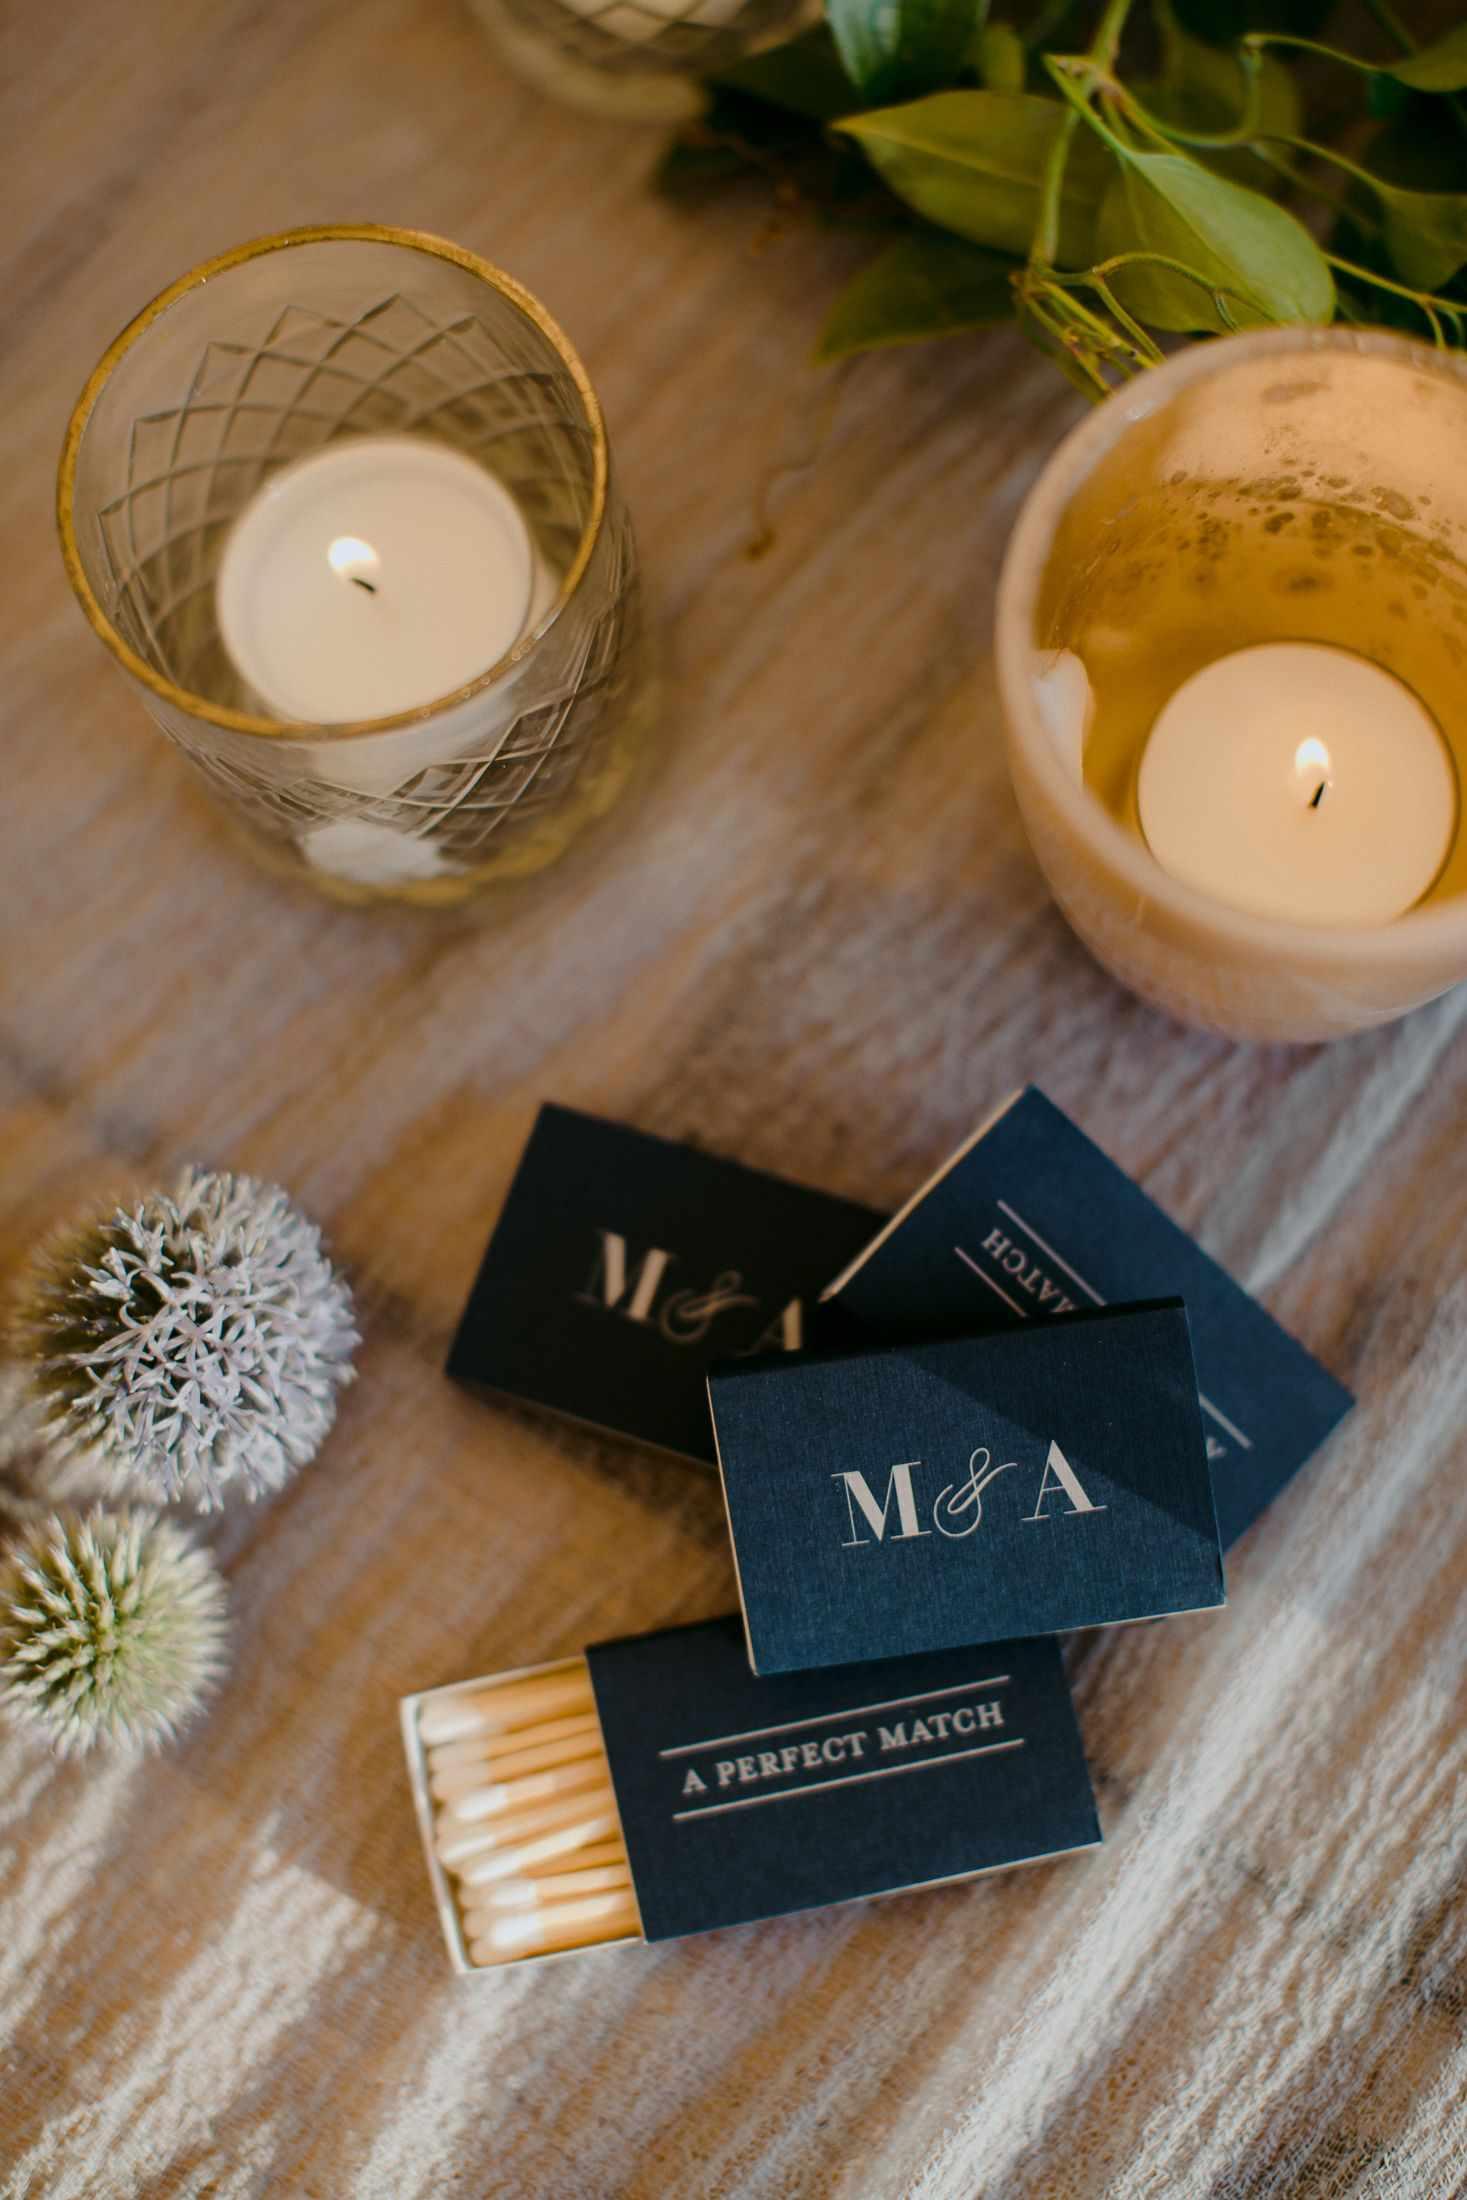 Custom match boxes as wedding favors